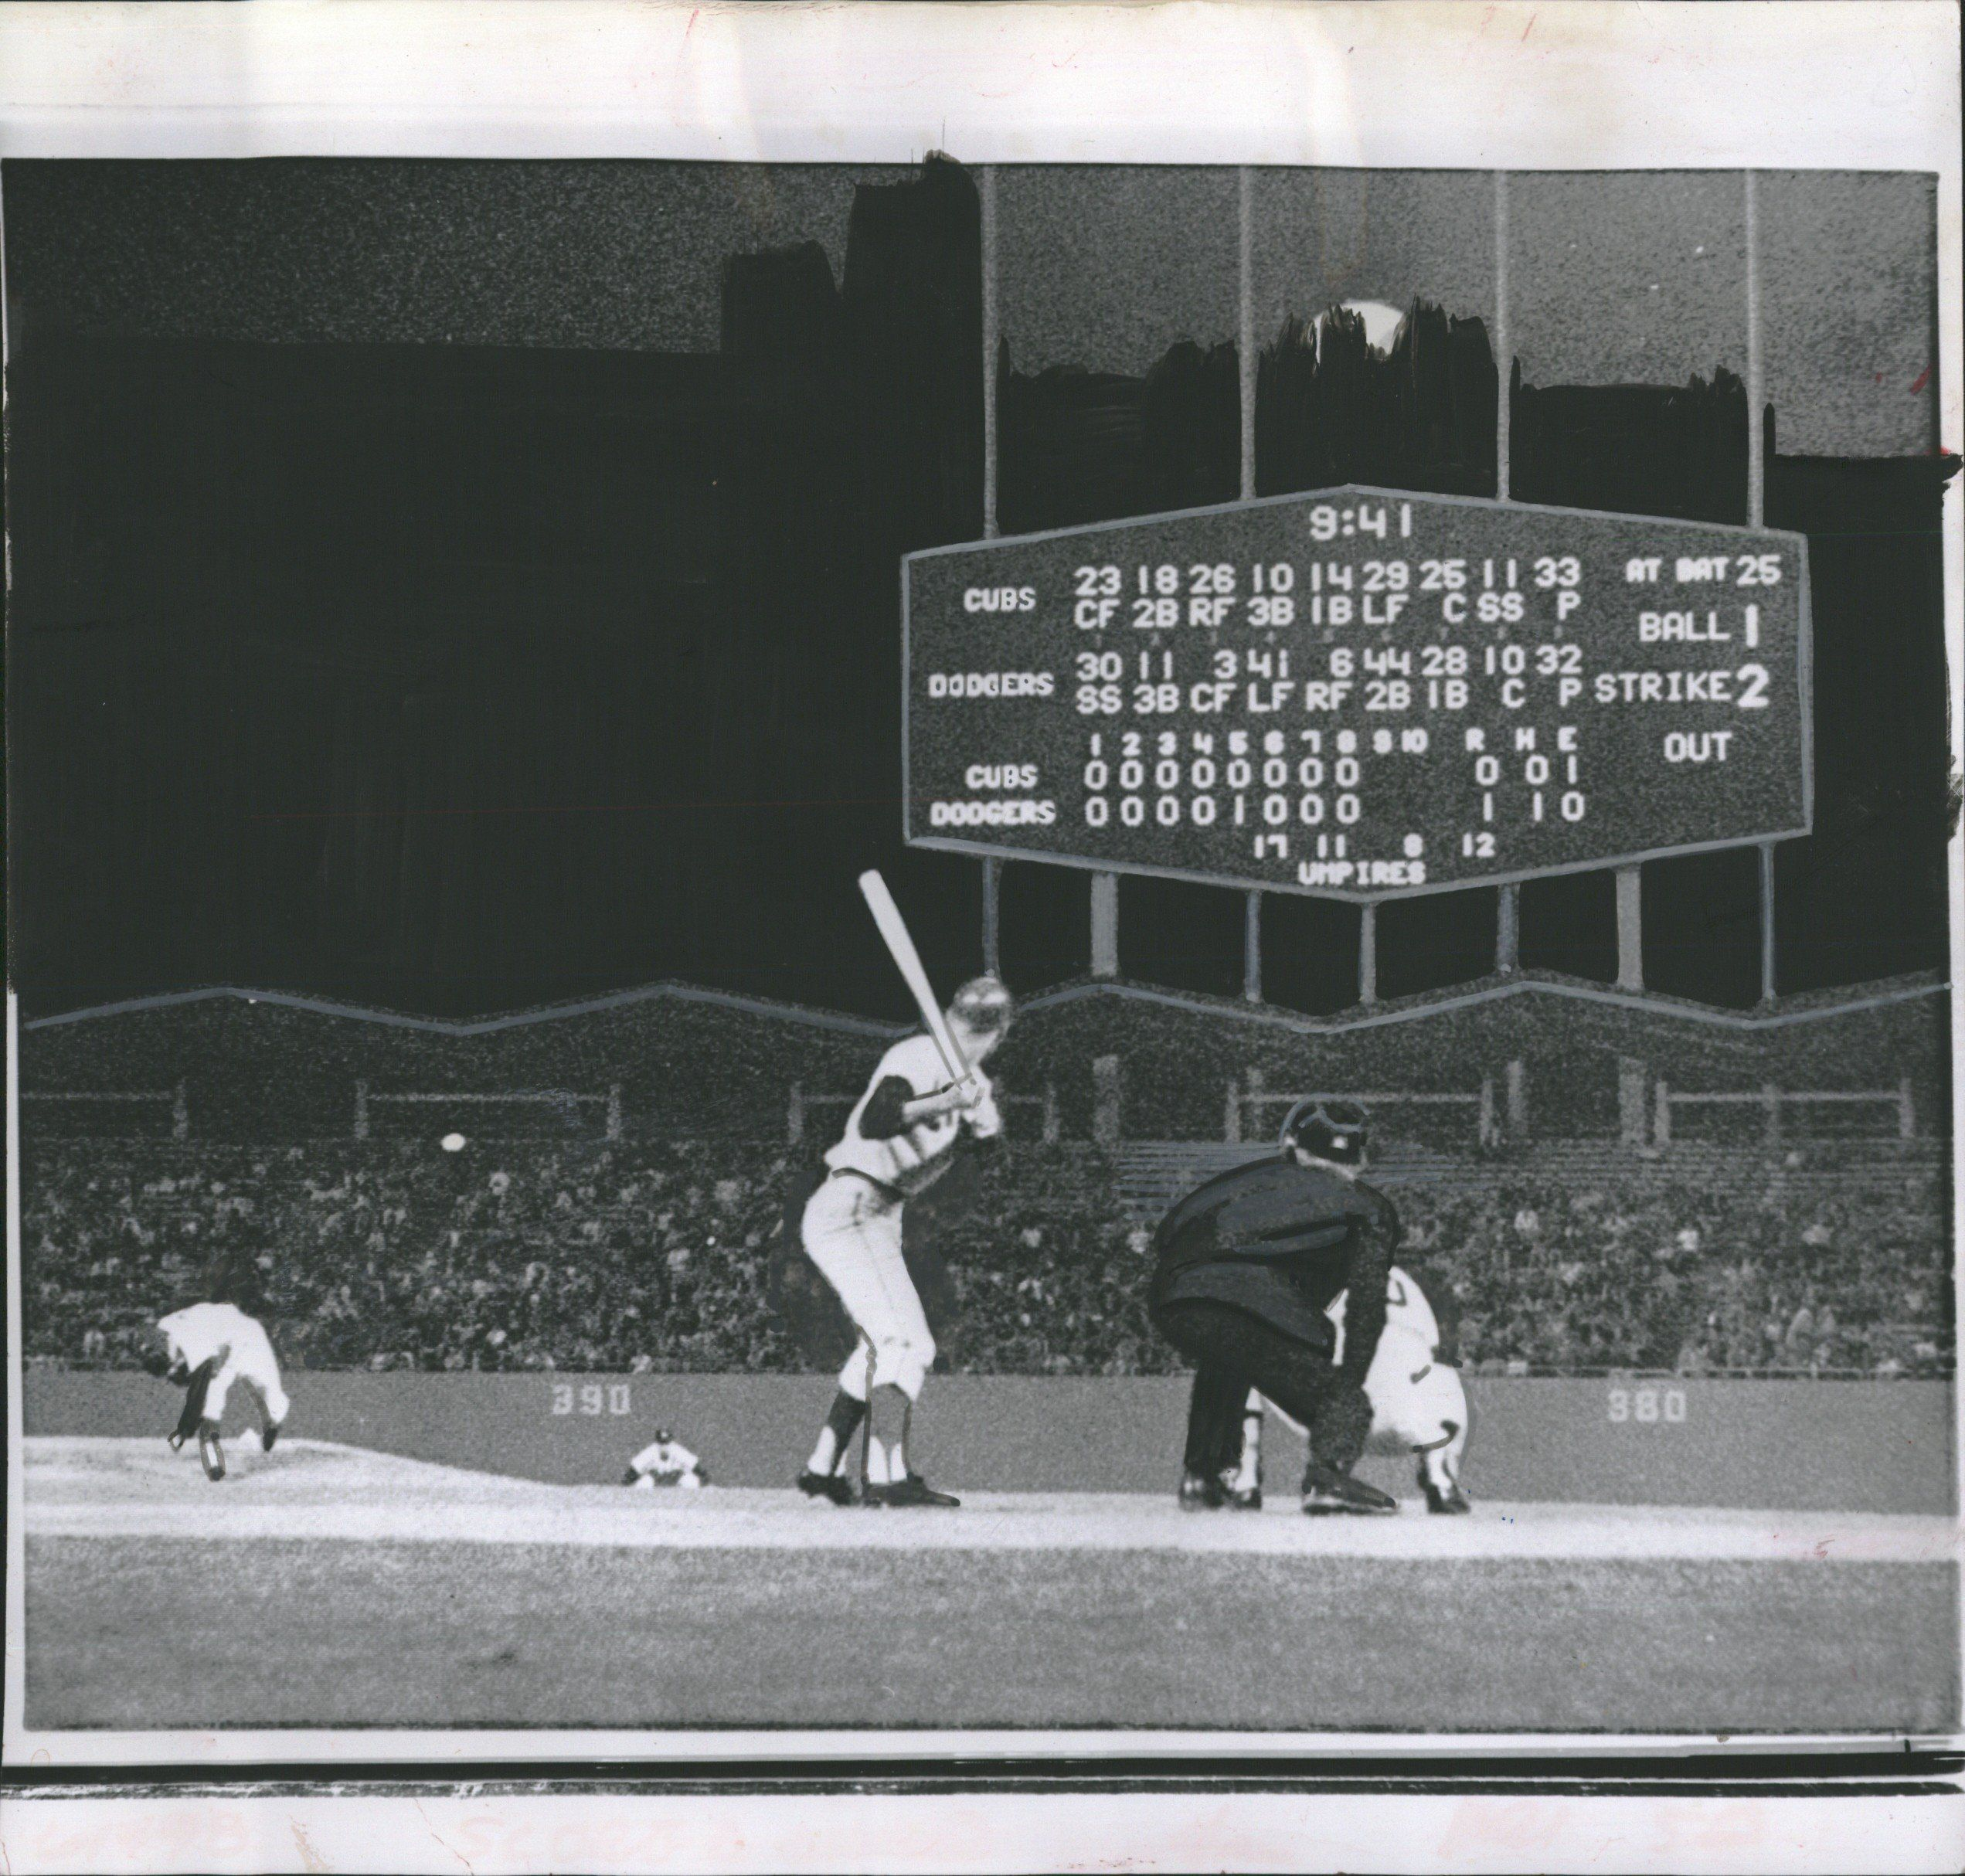 Sandy Koufax Perfect Game vs Cubs September 9, 1965